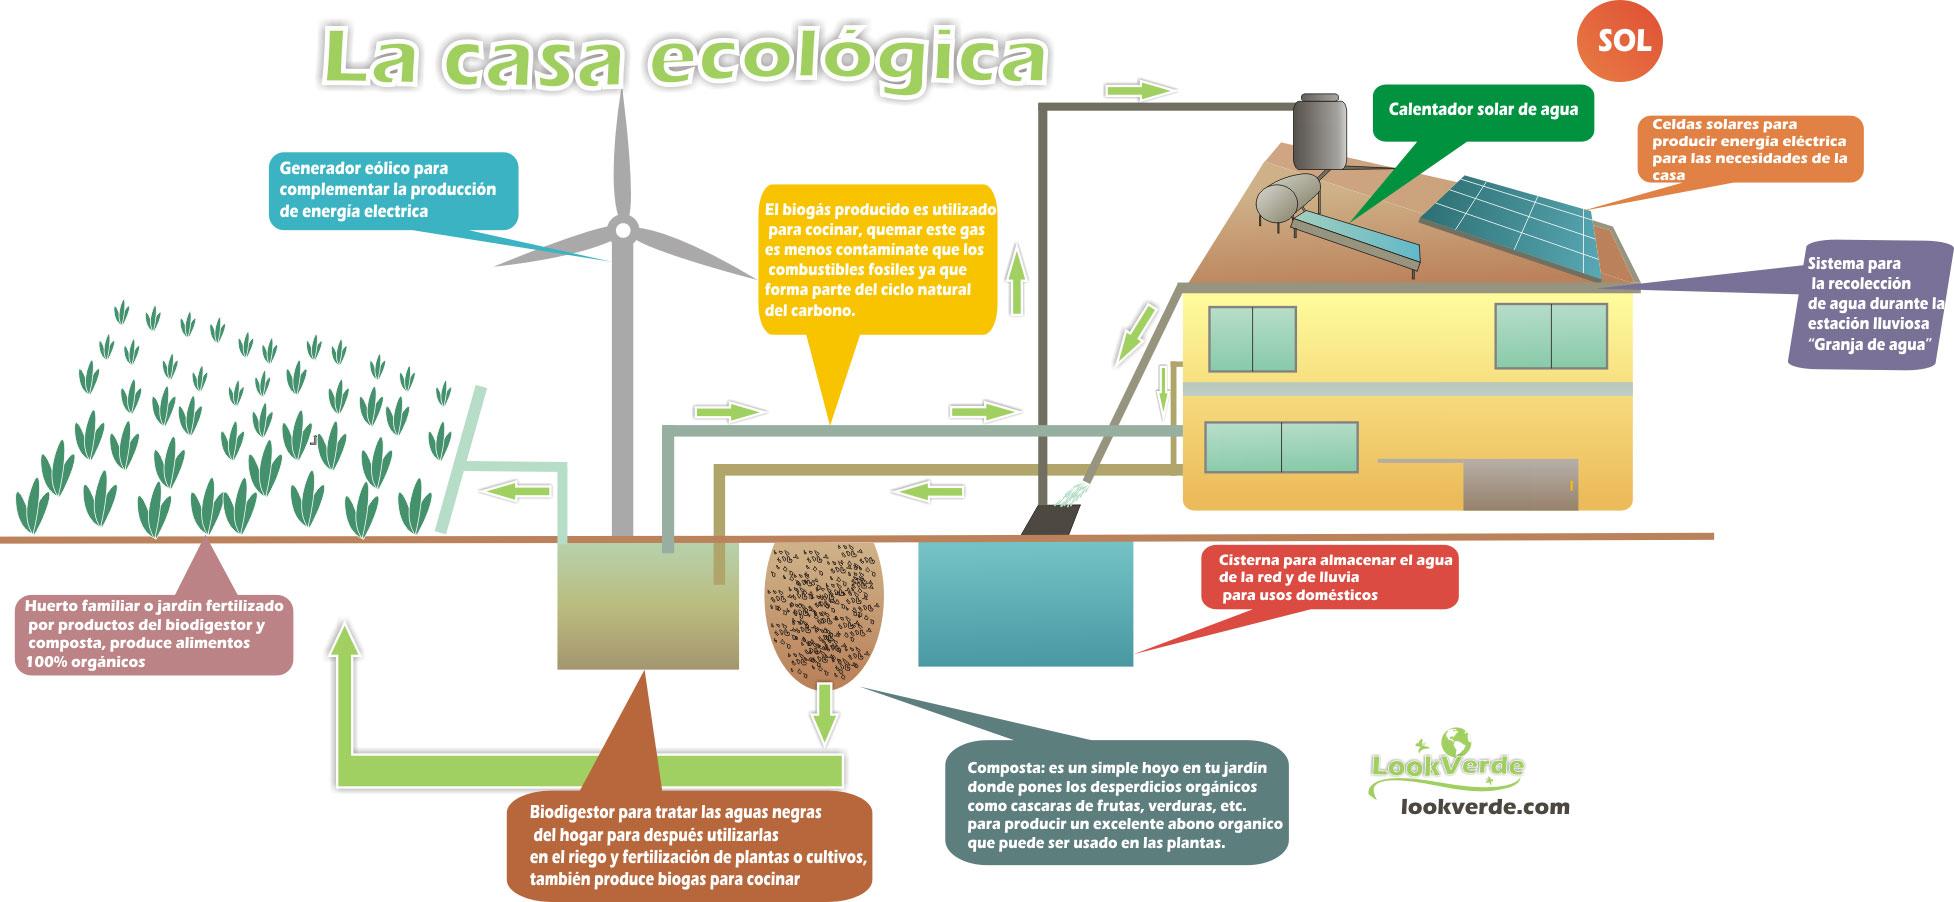 Image casa ecologica jpg wiki casasolar2c fandom powered by wikia Casa prefabricada ecologica autosuficiente